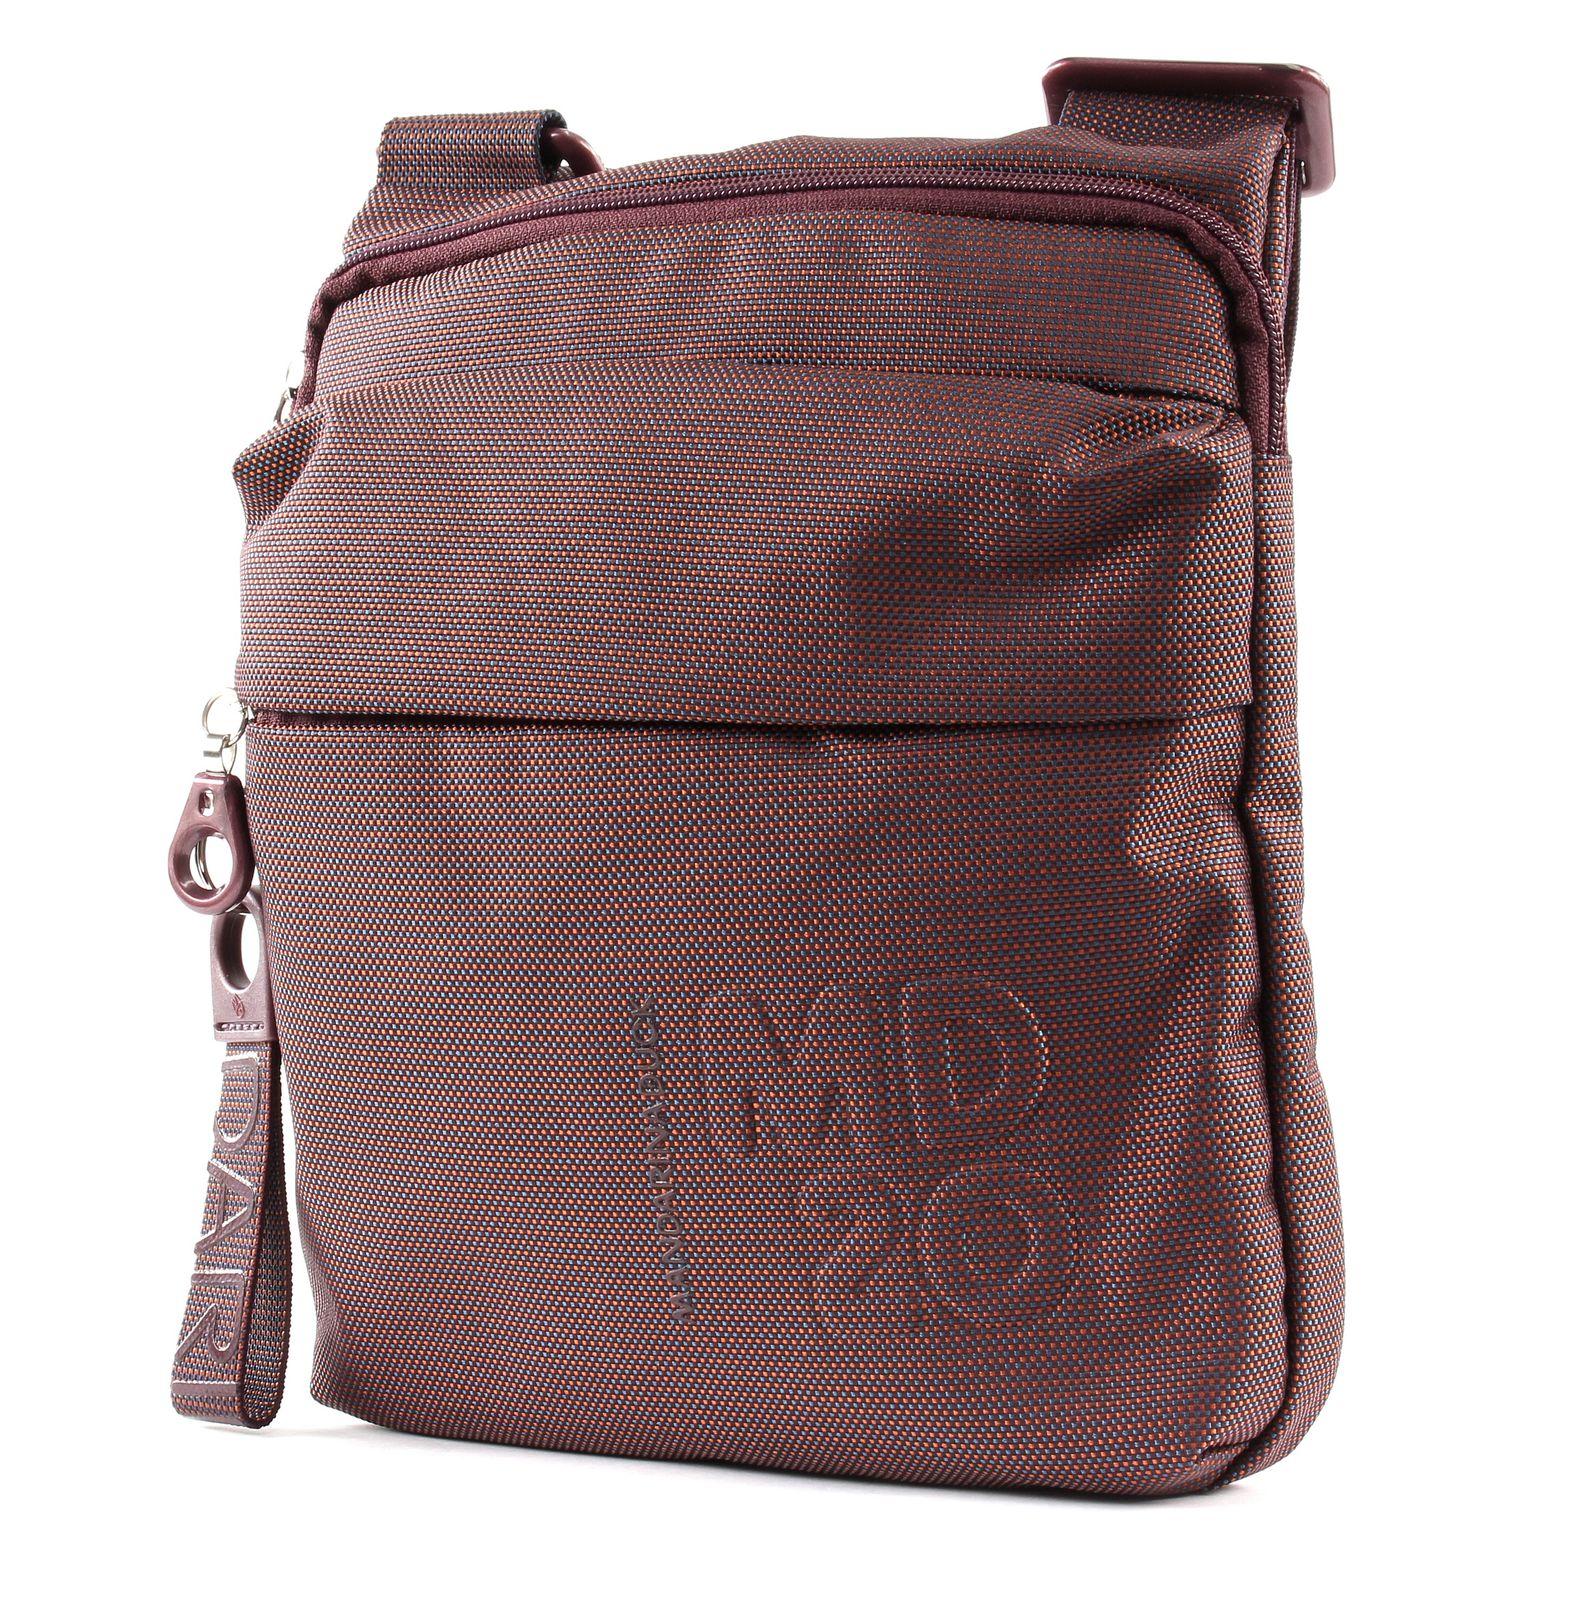 MANDARINA DUCK MD20 Small Crossover Umhängetasche Tasche Bouganville Rot Beige